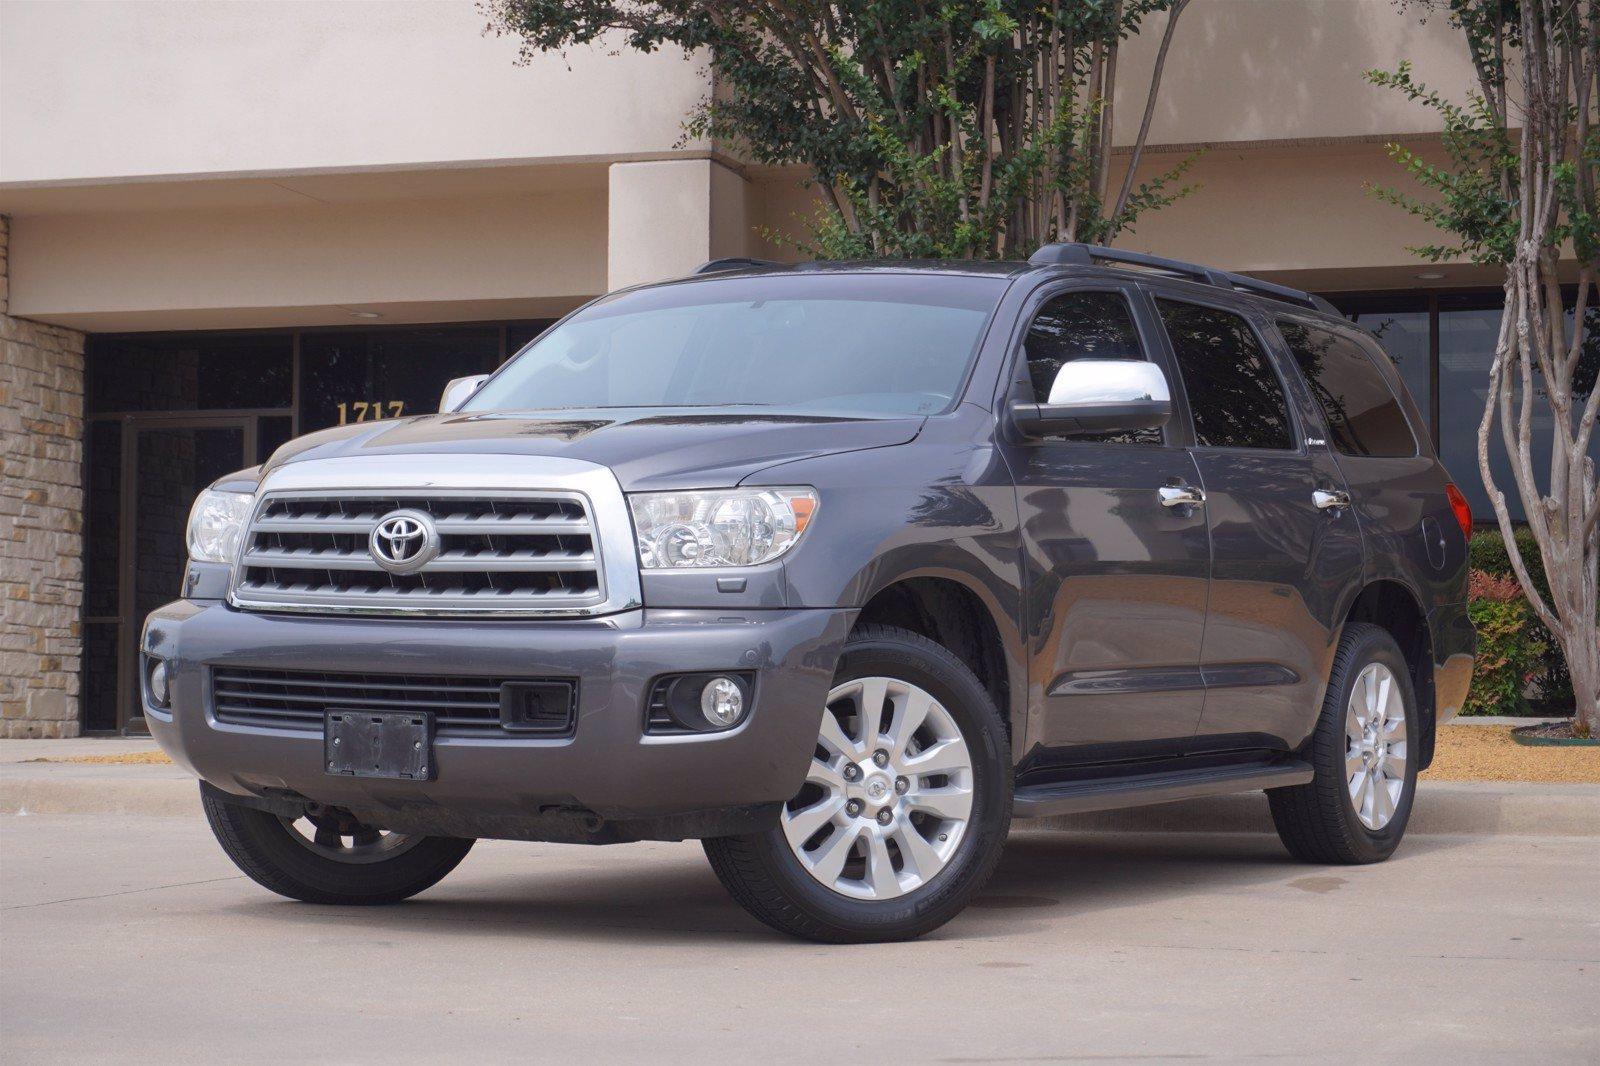 2016 Toyota Sequoia Vehicle Photo in Grapevine, TX 76051